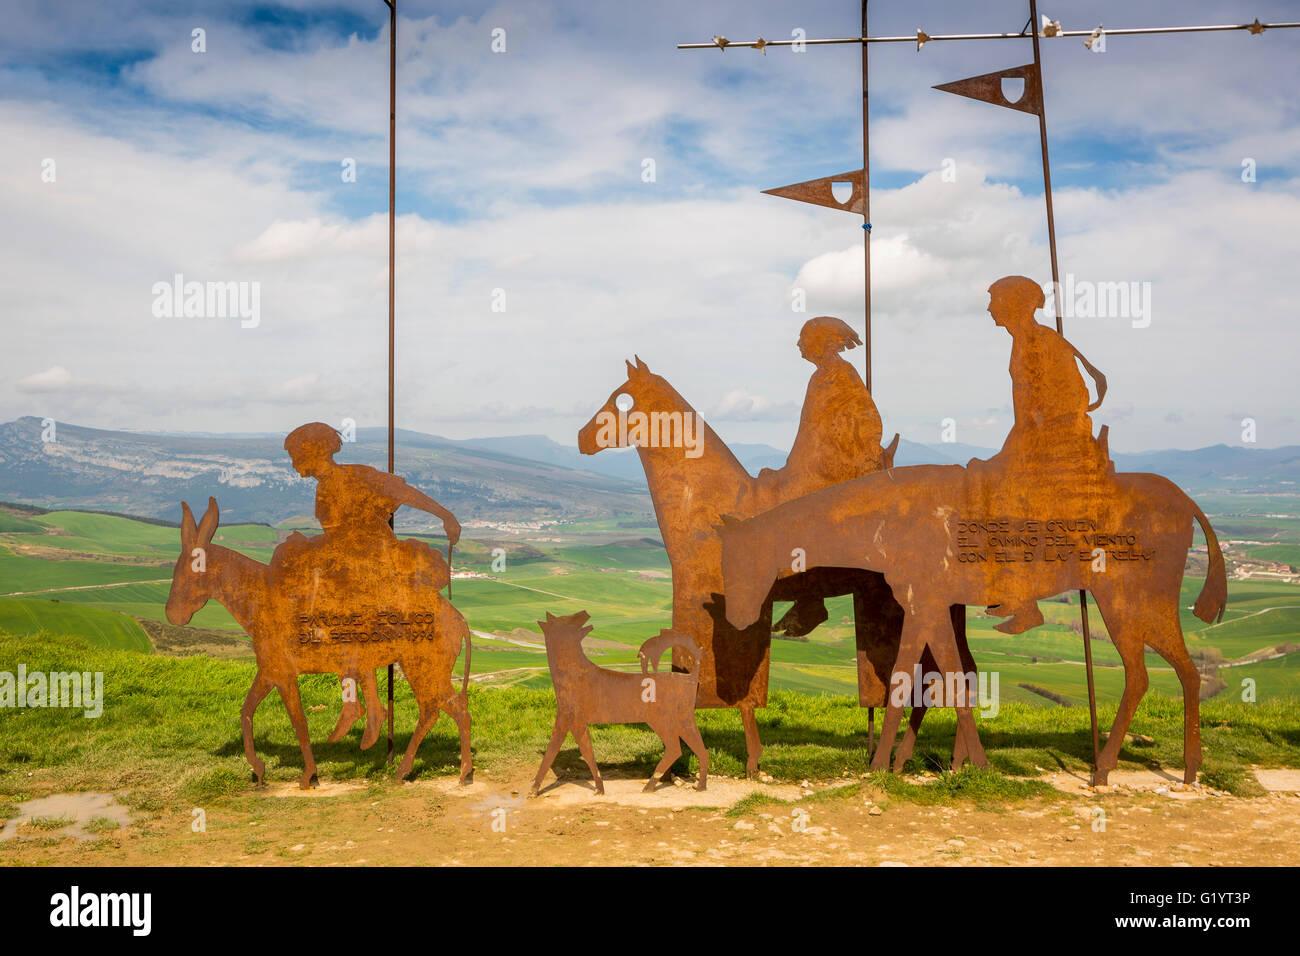 Camino de Santiago - from St Jean de Port, France to Burgos, Apain. - Stock Image